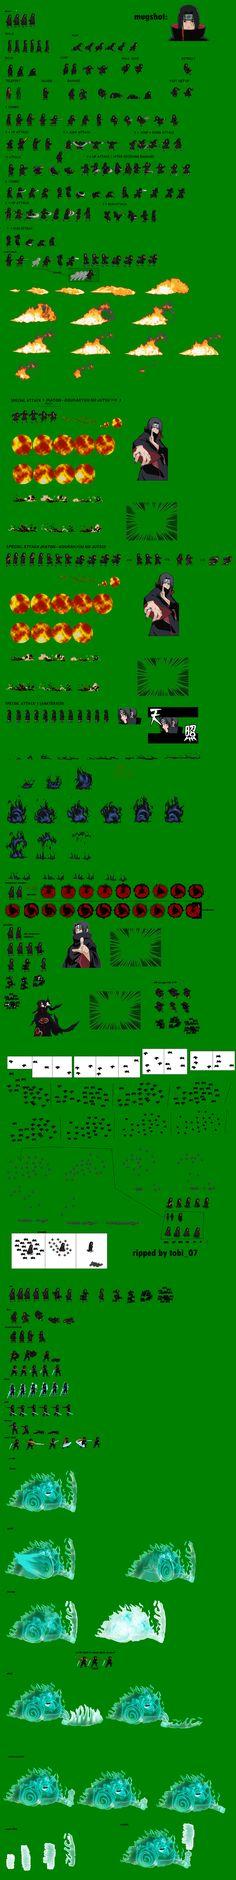 Itachi Uchiha's Other Jutsus Sprite Sheet by DanteWreckmen-999